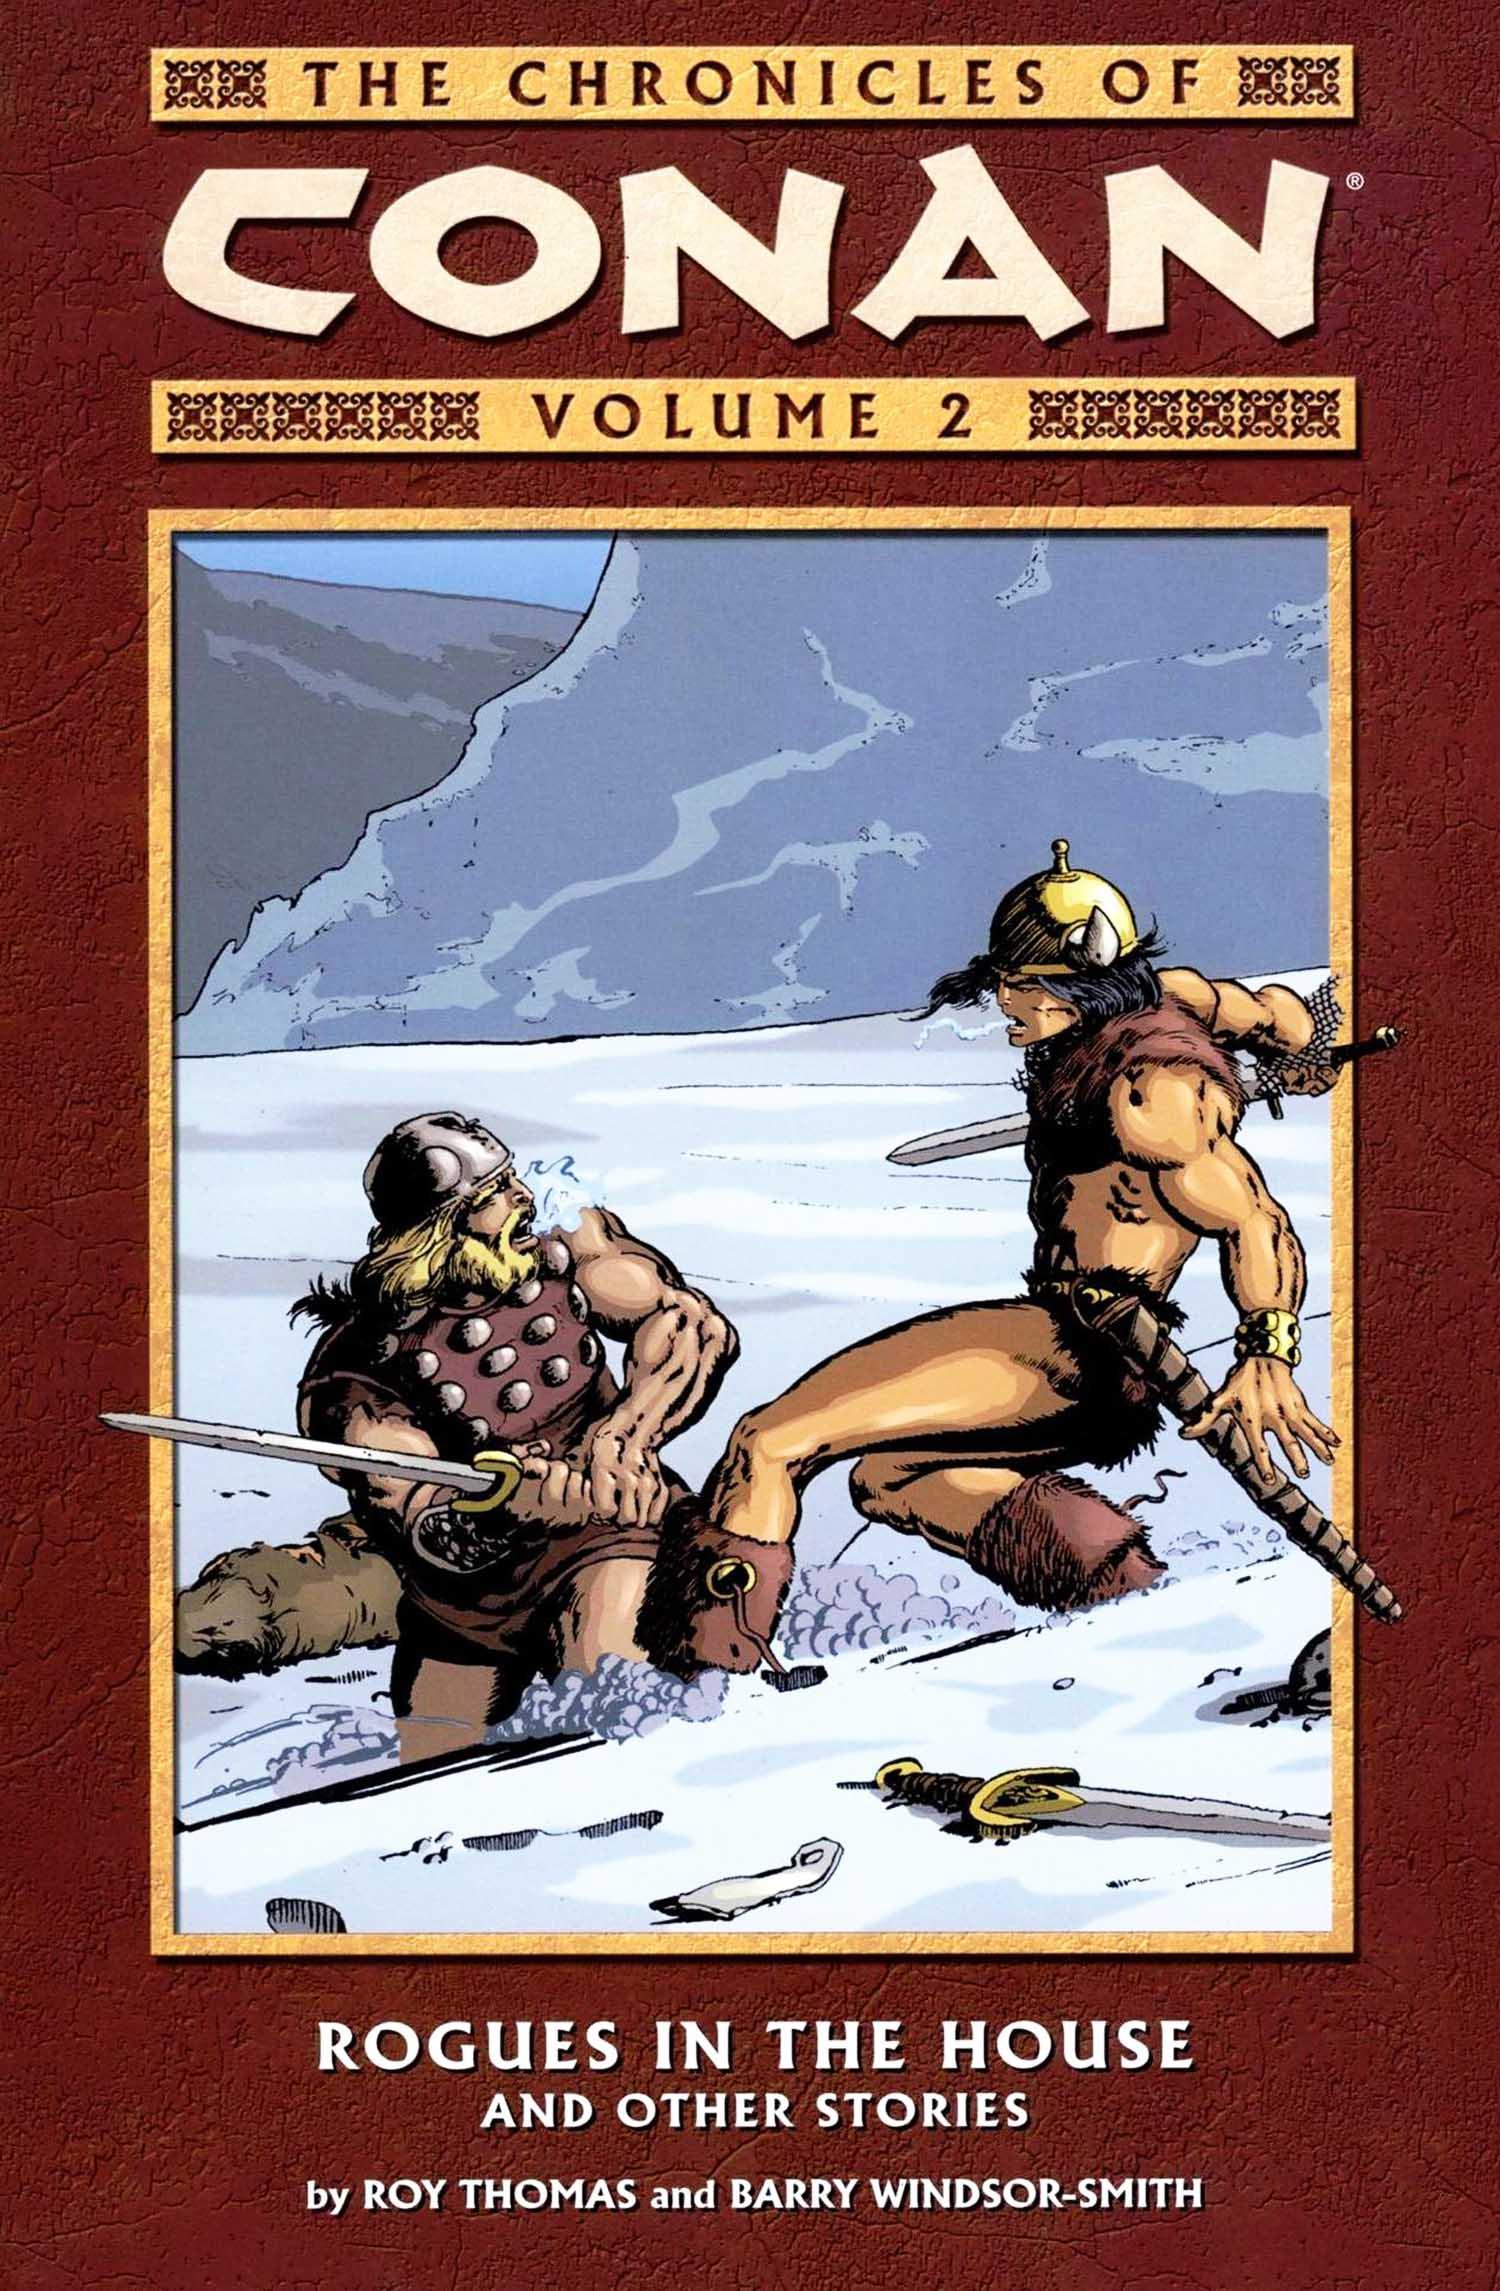 The Chronicles of Conan Volume 2